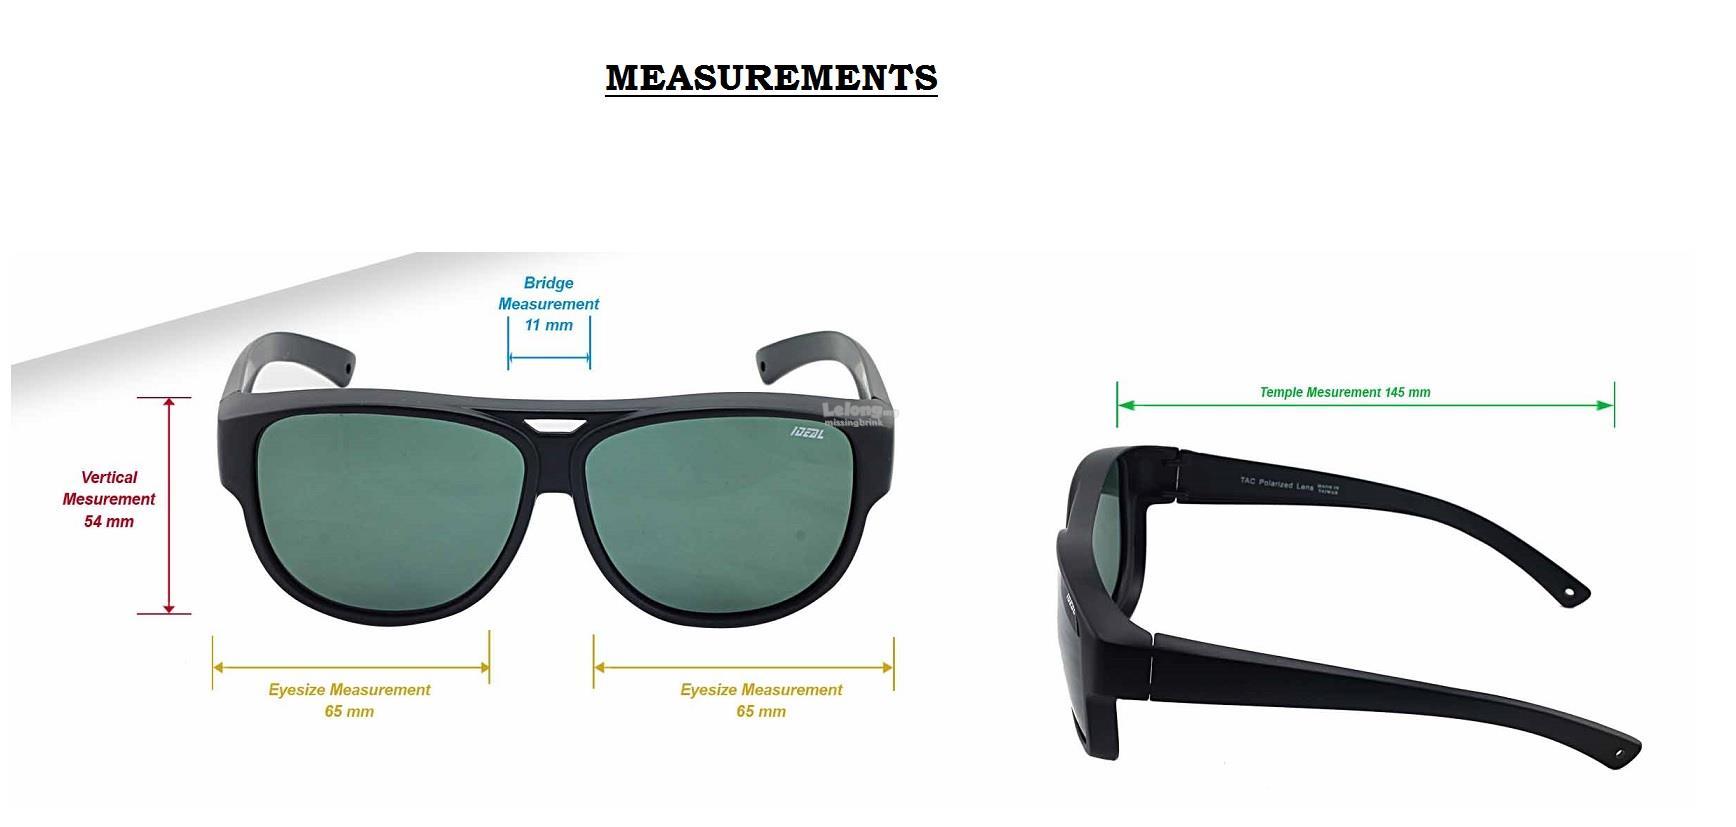 5bf4b1b288c IDEAL - Unisex FitOver Overlap TAC Polarized Sunglasses - Model 8975